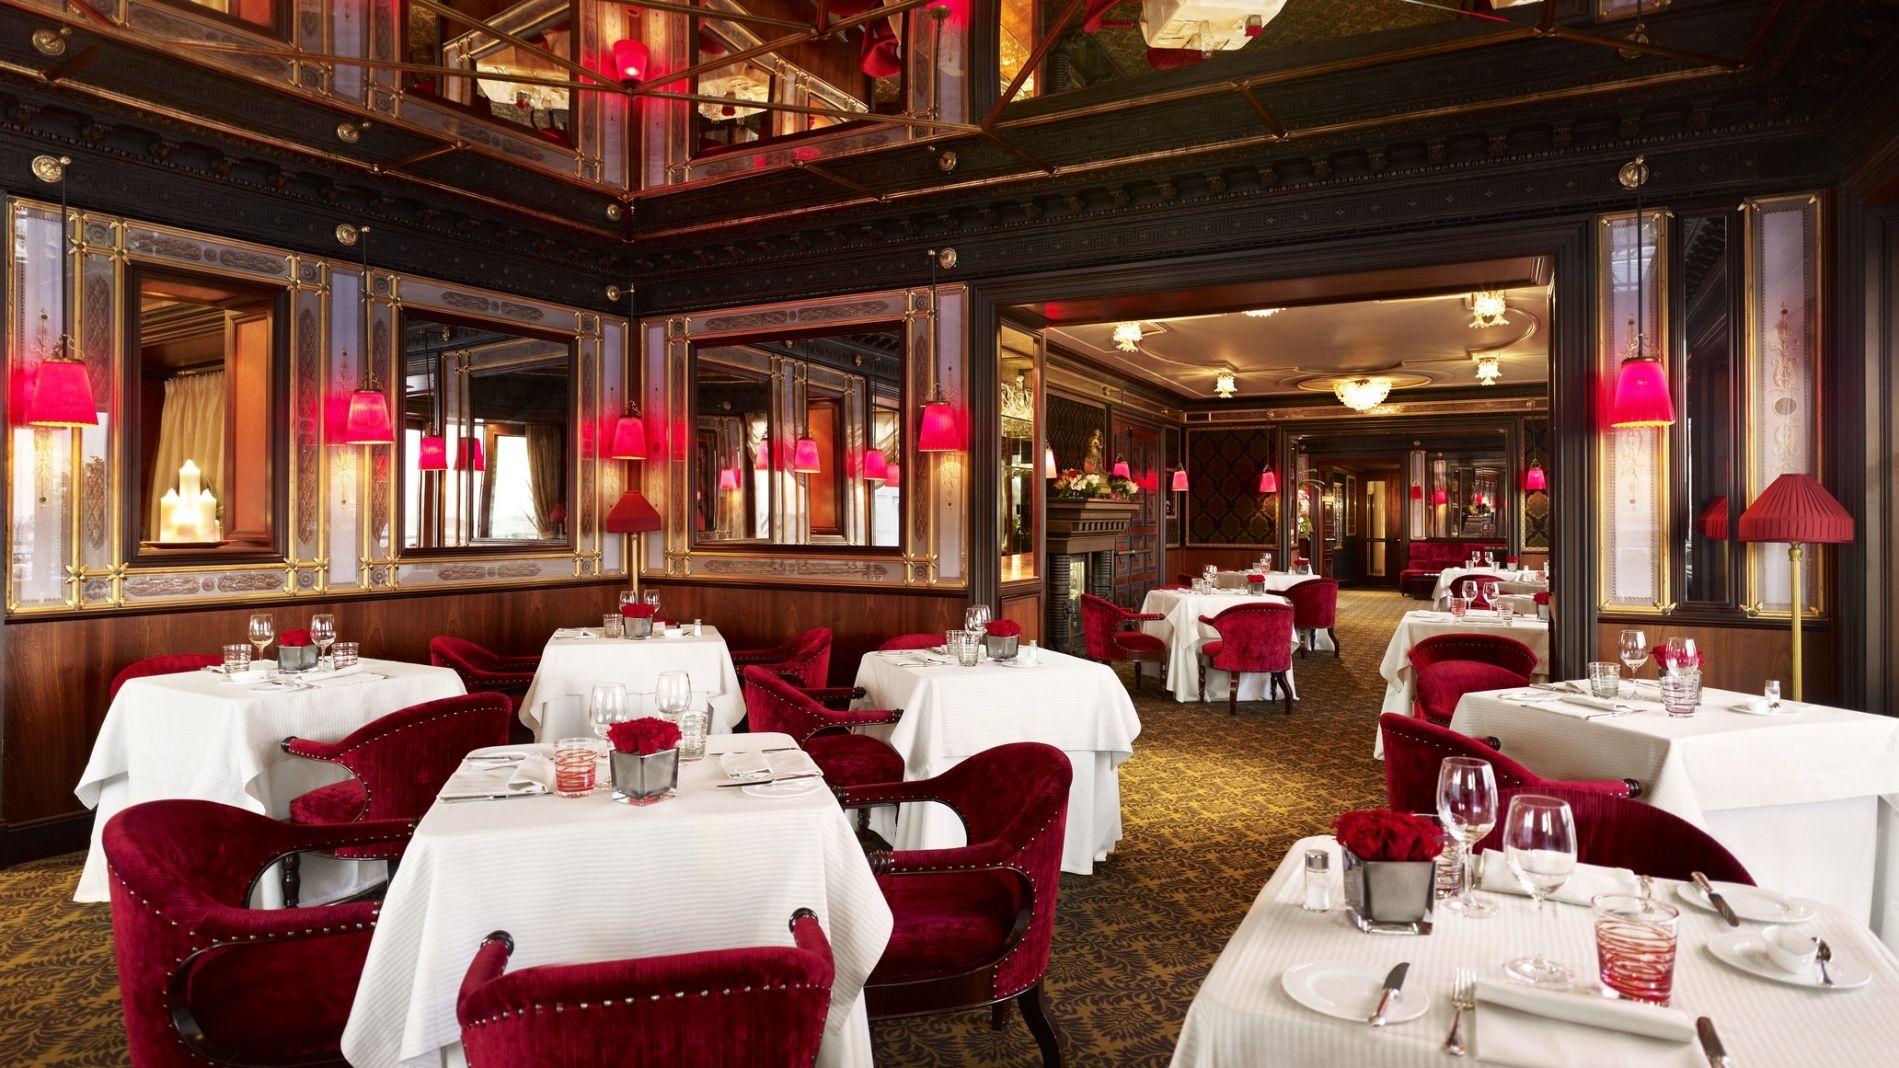 restaurant Terrazza Danieli, Venice | Interior_Restaurants, bars etc ...